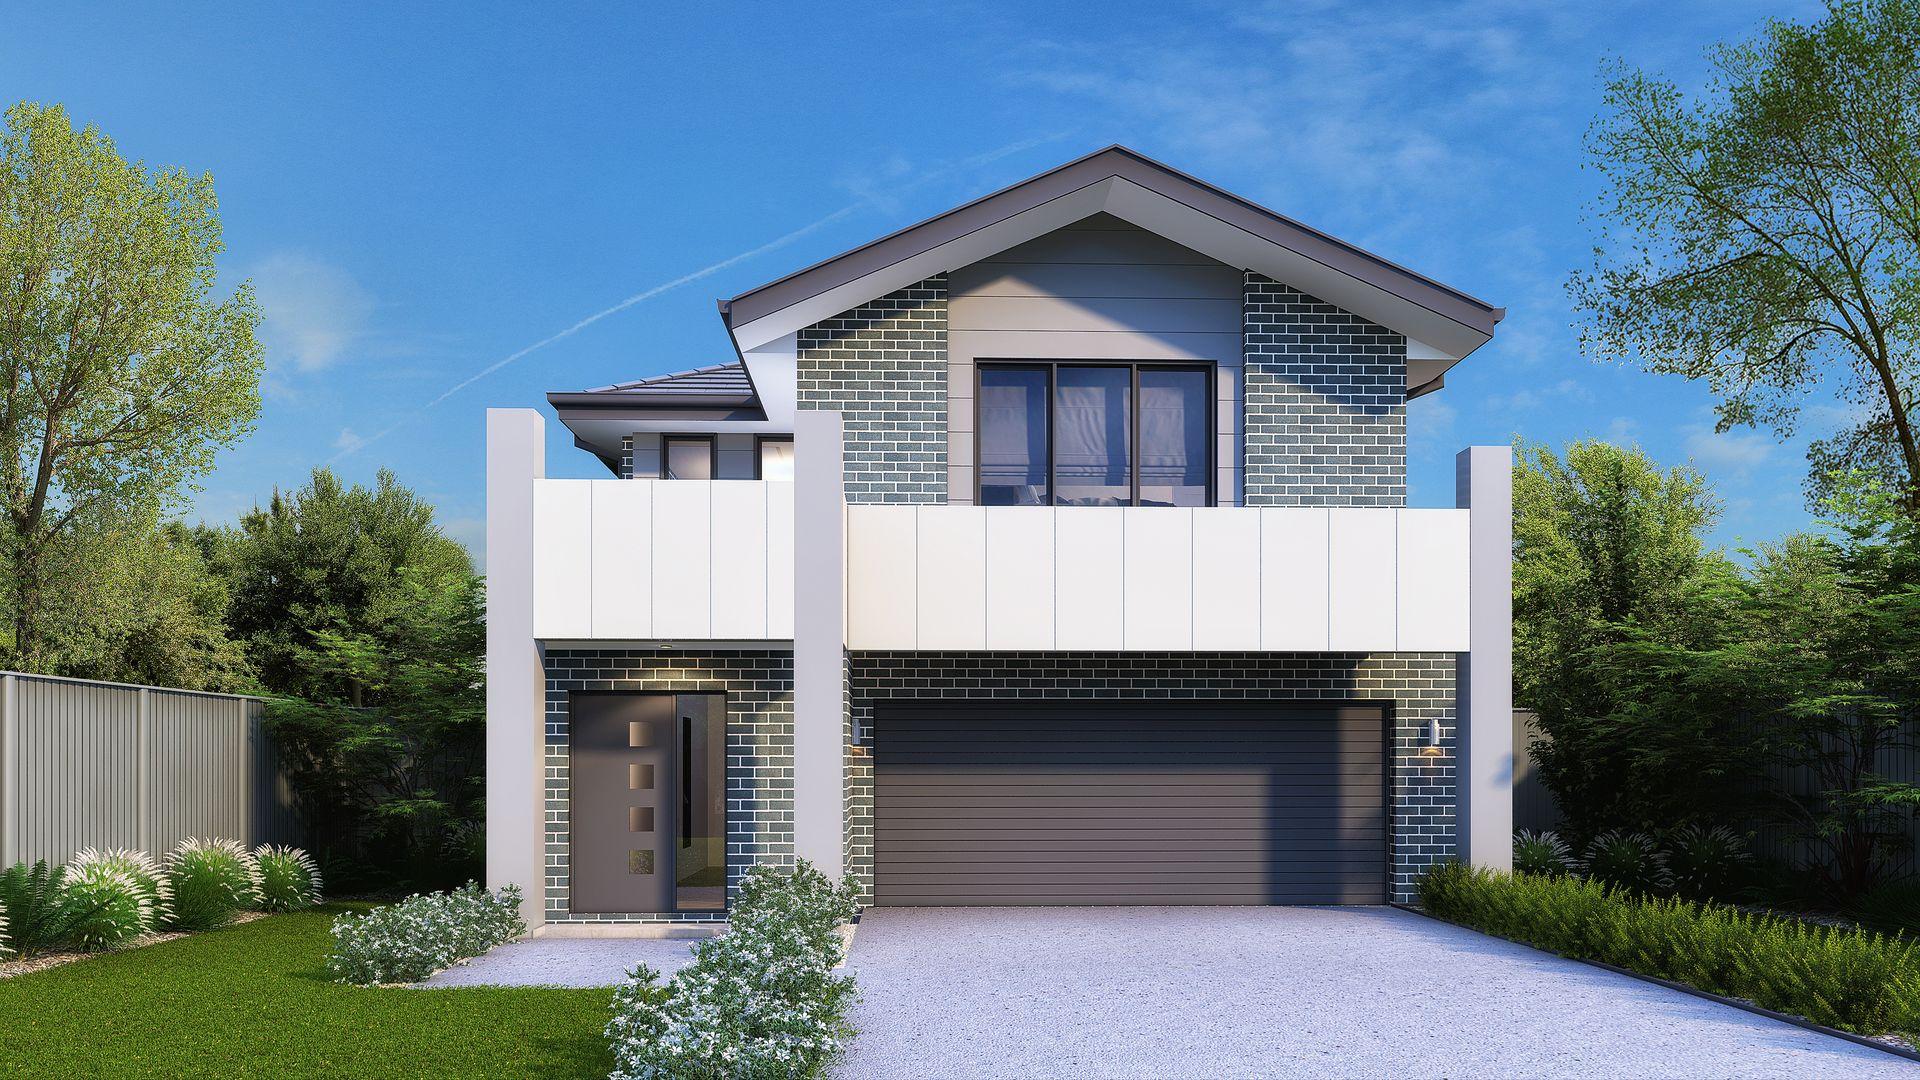 Lot 27 Alderton Drive, Colebee NSW 2761, Image 0